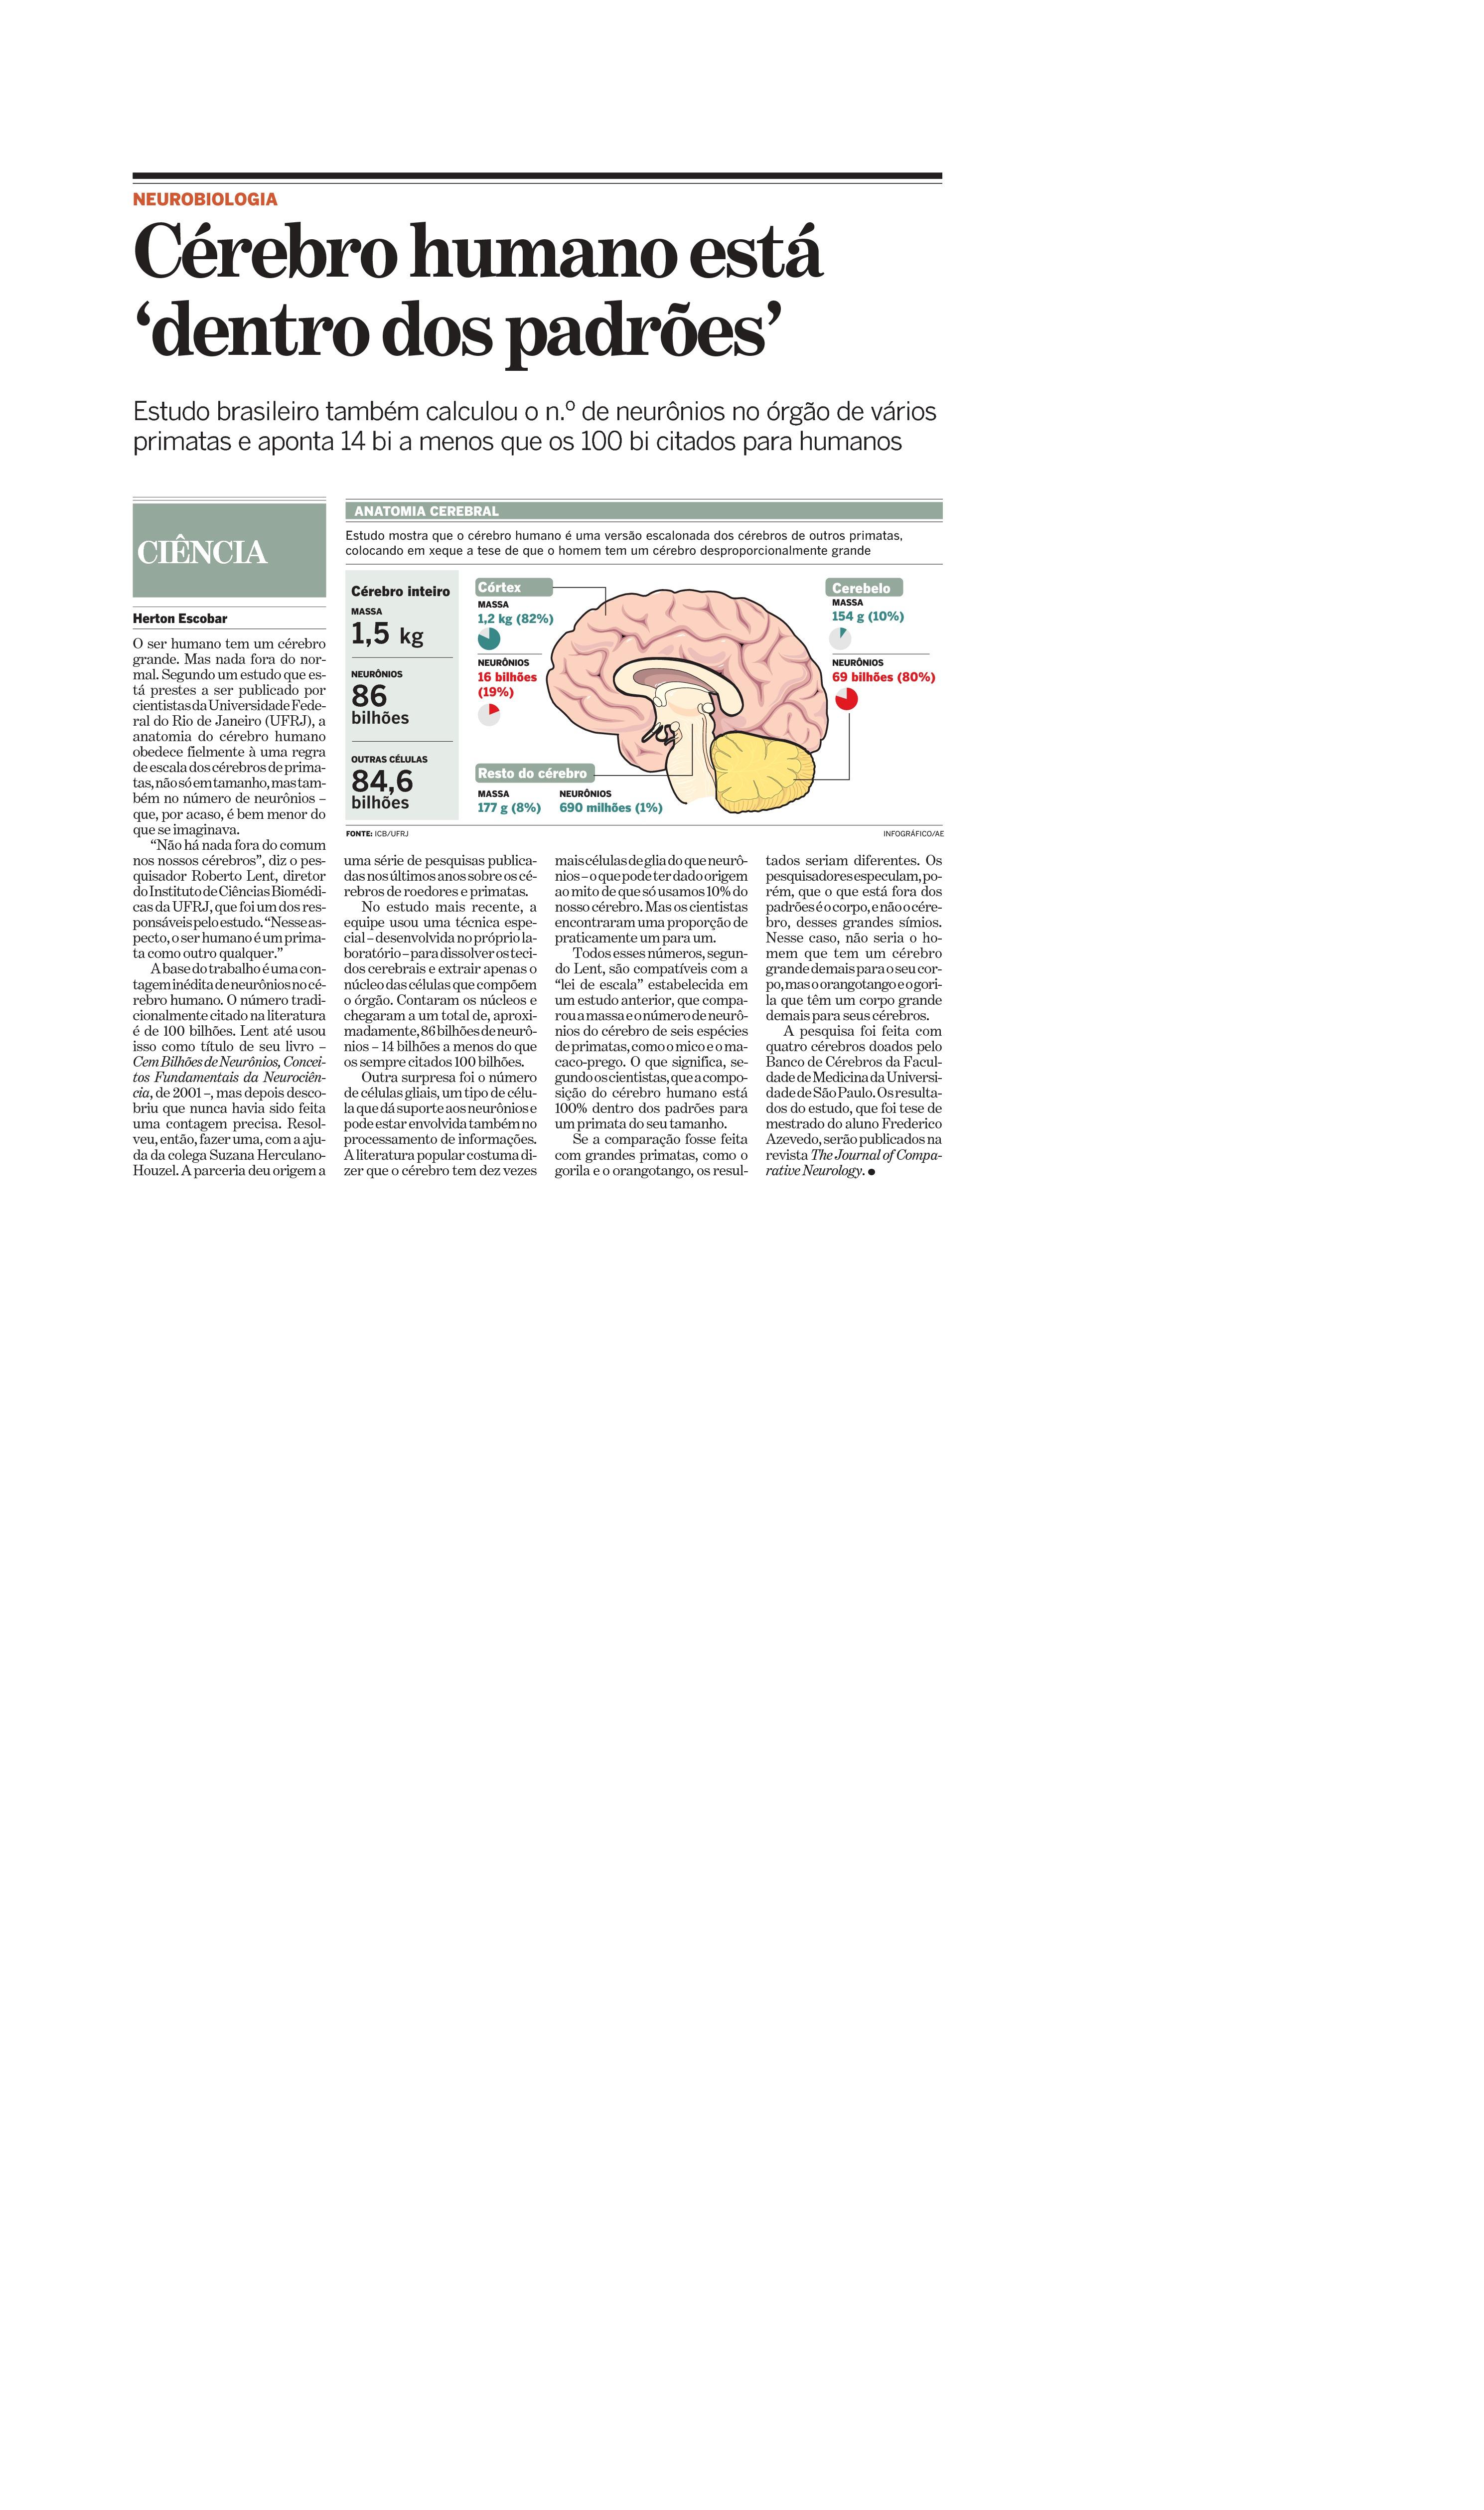 Cérebro humano está